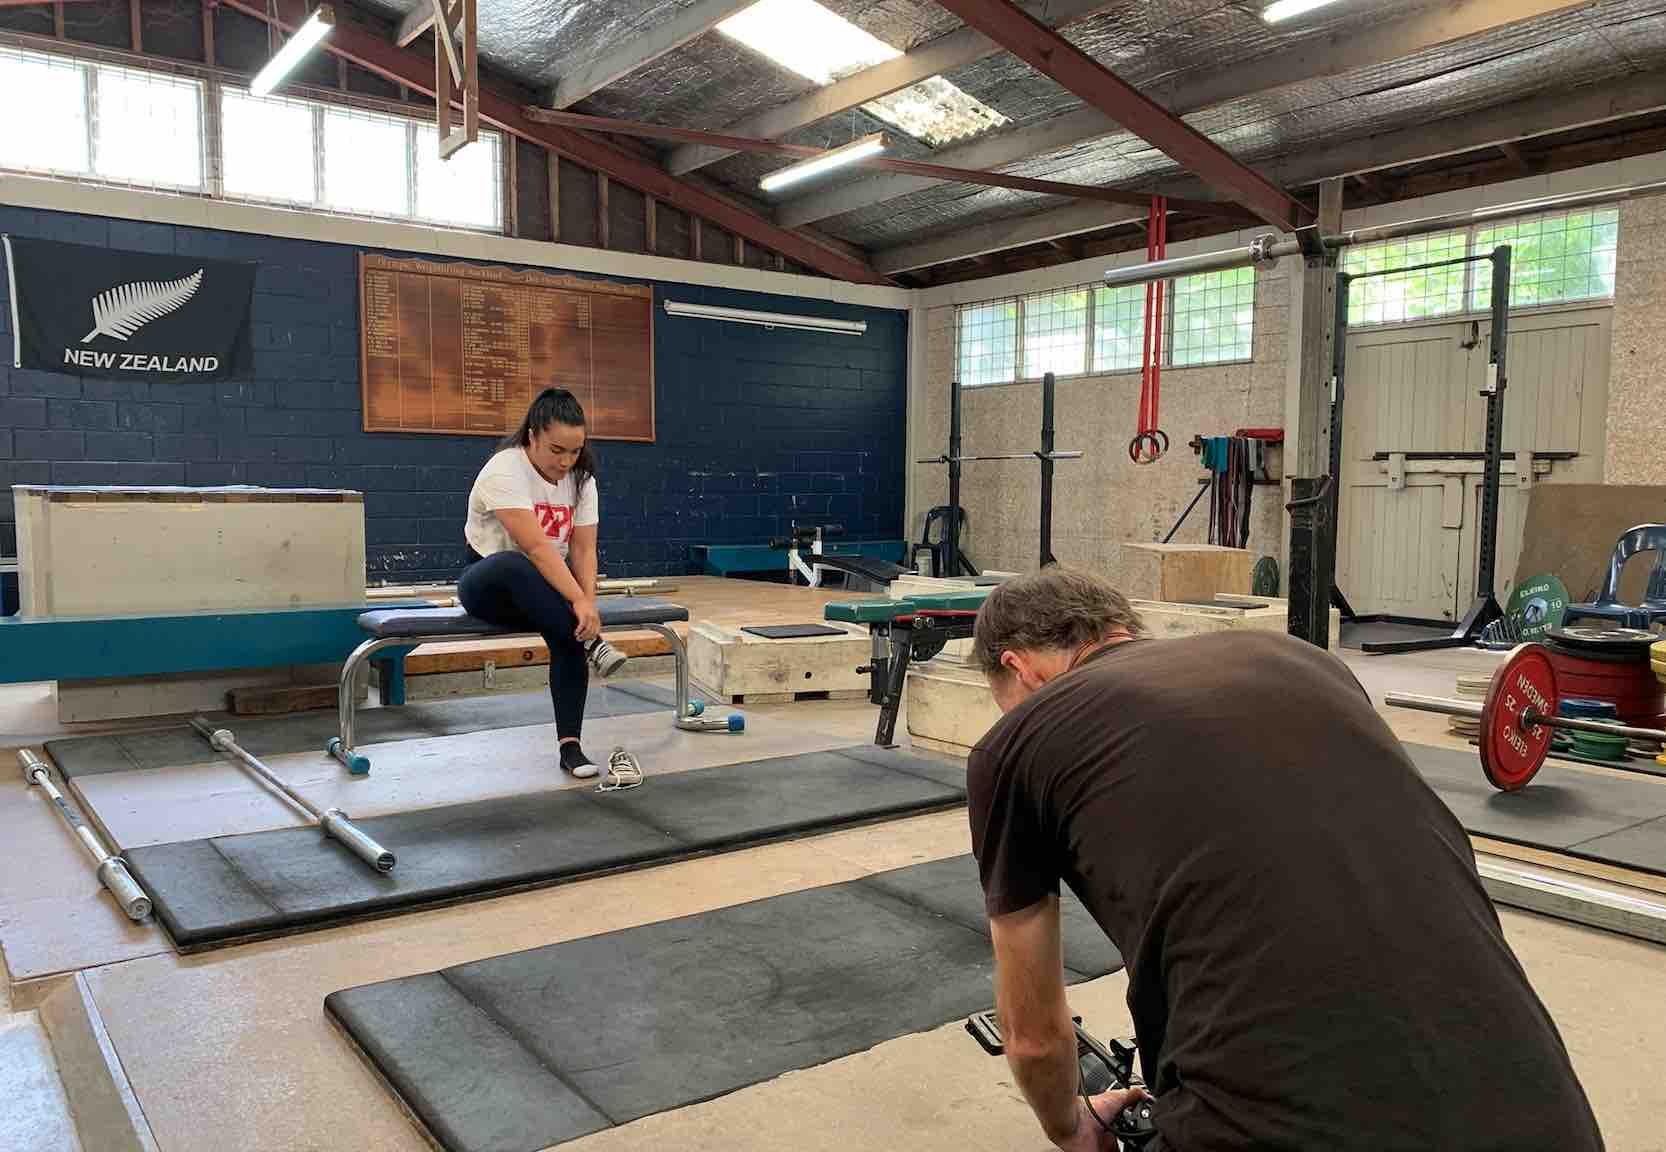 Karlina Tongotea is a world powerlifting champion